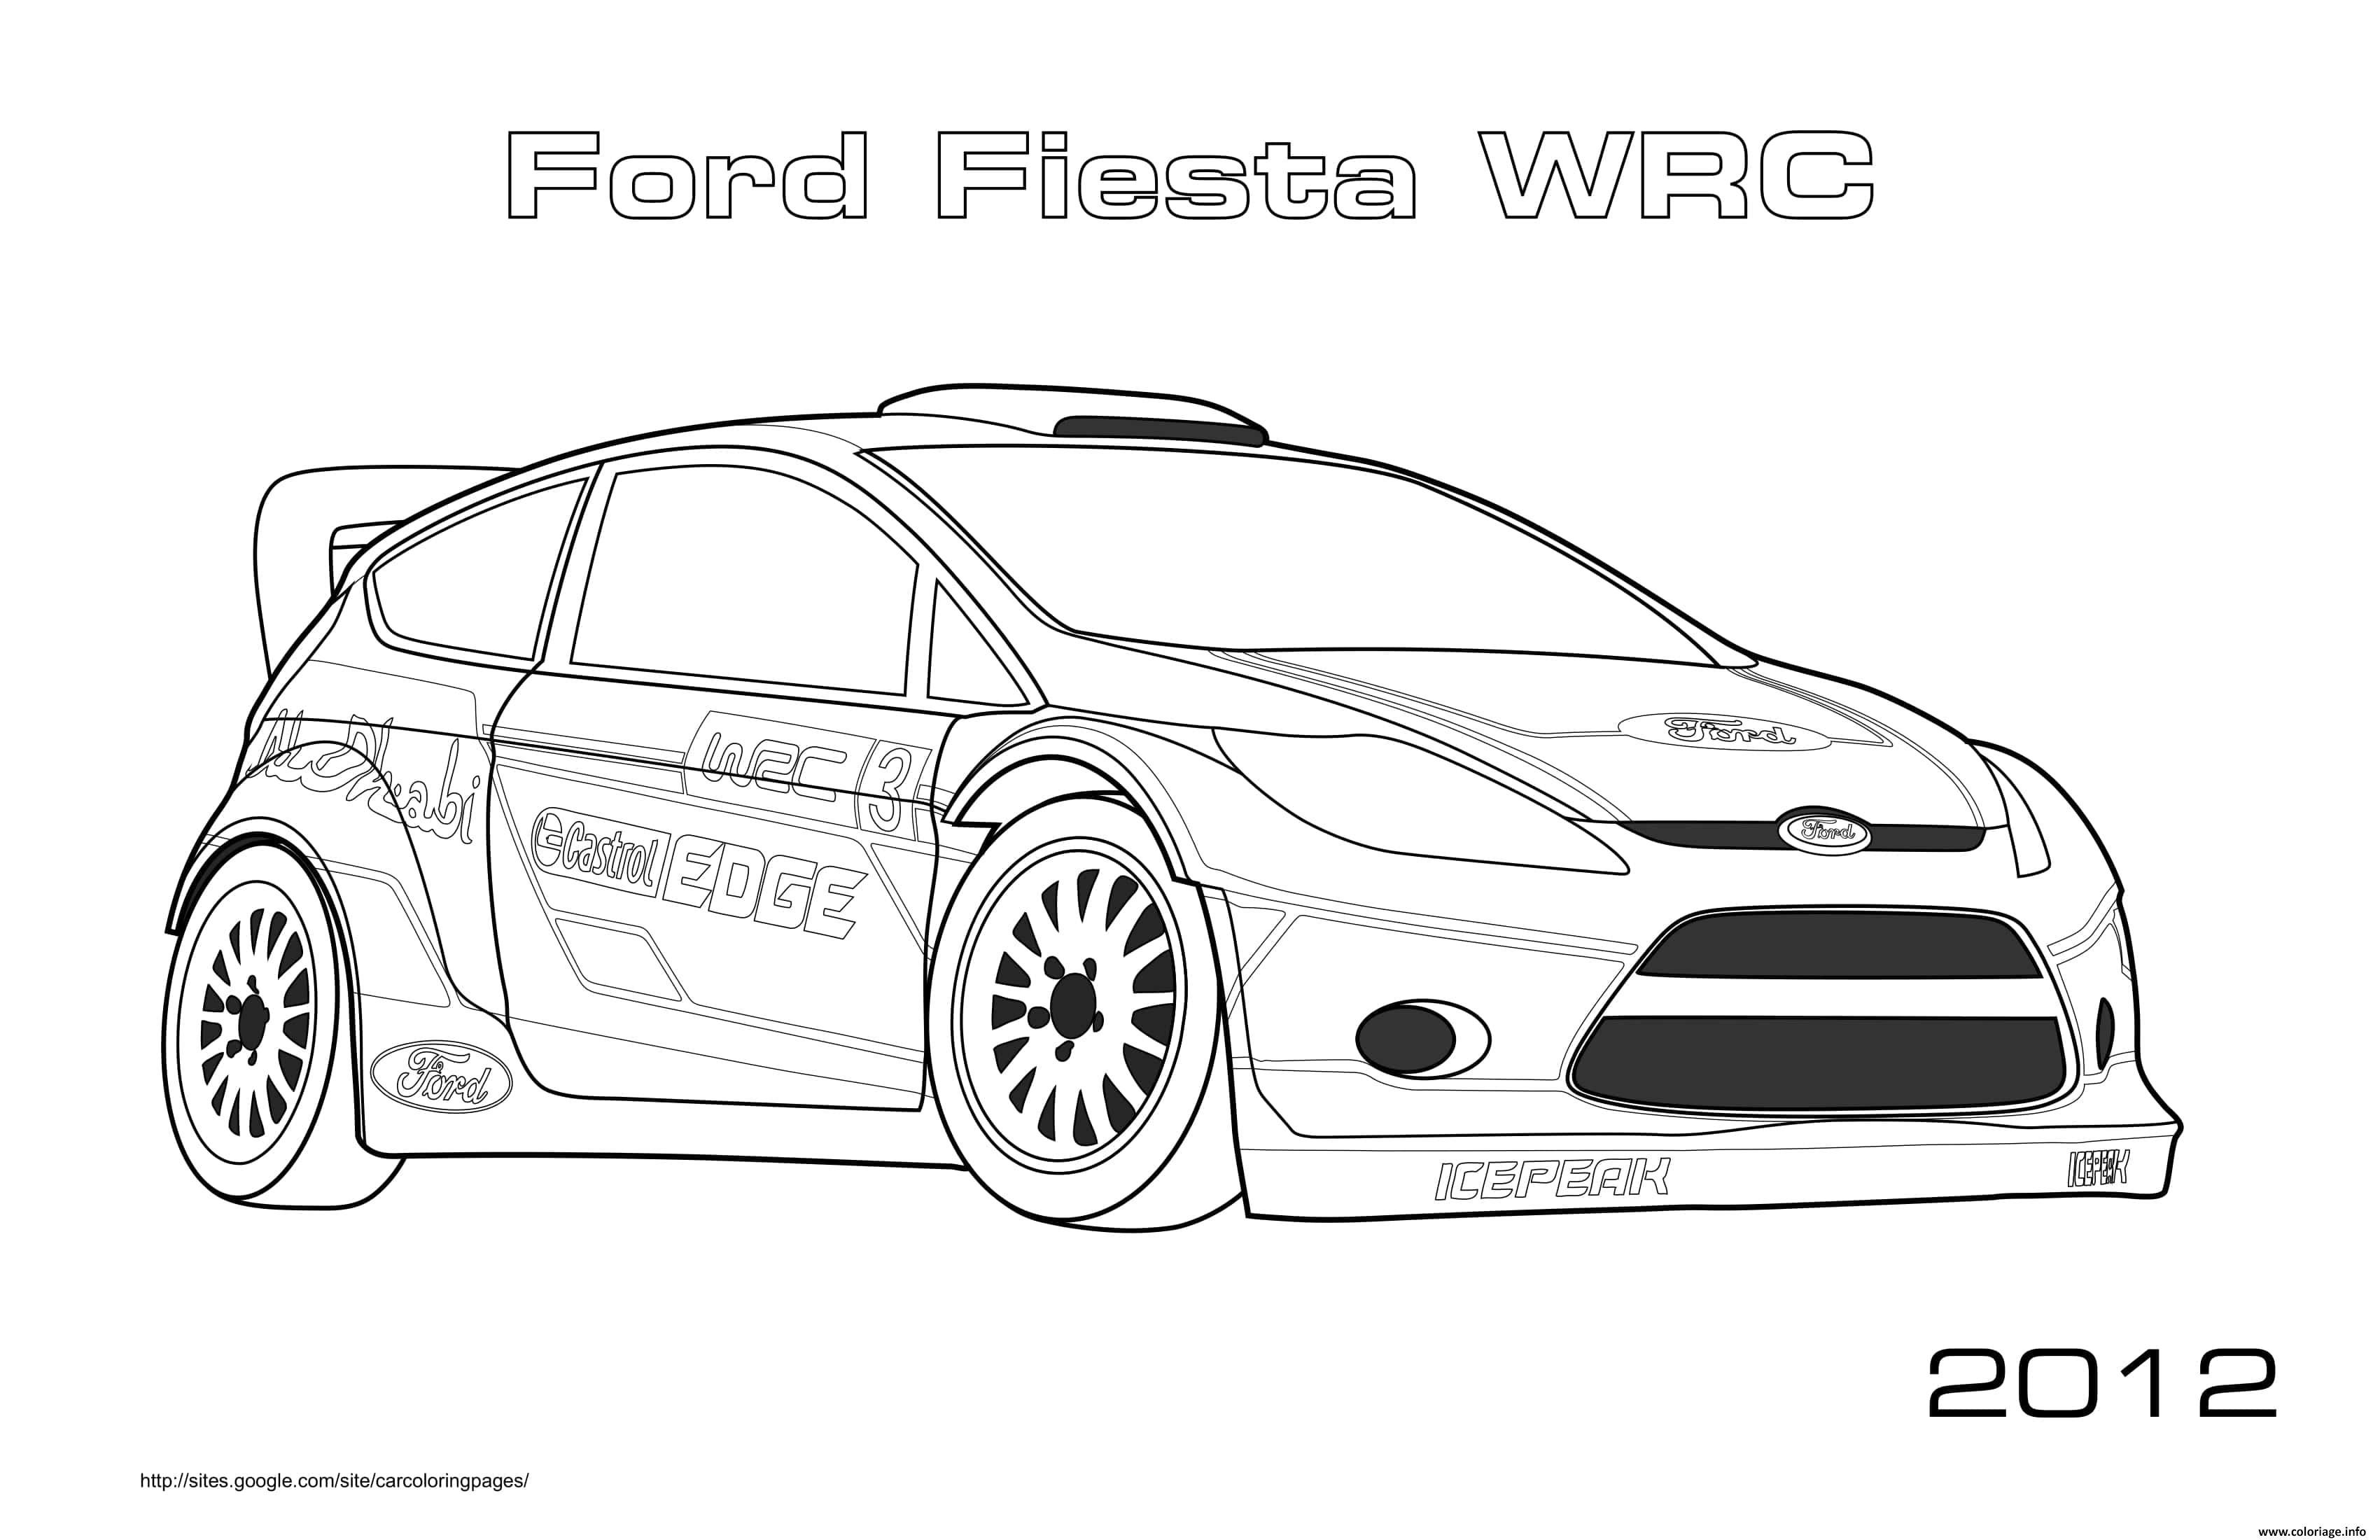 Dessin Ford Fiesta Wrc 2012 Coloriage Gratuit à Imprimer